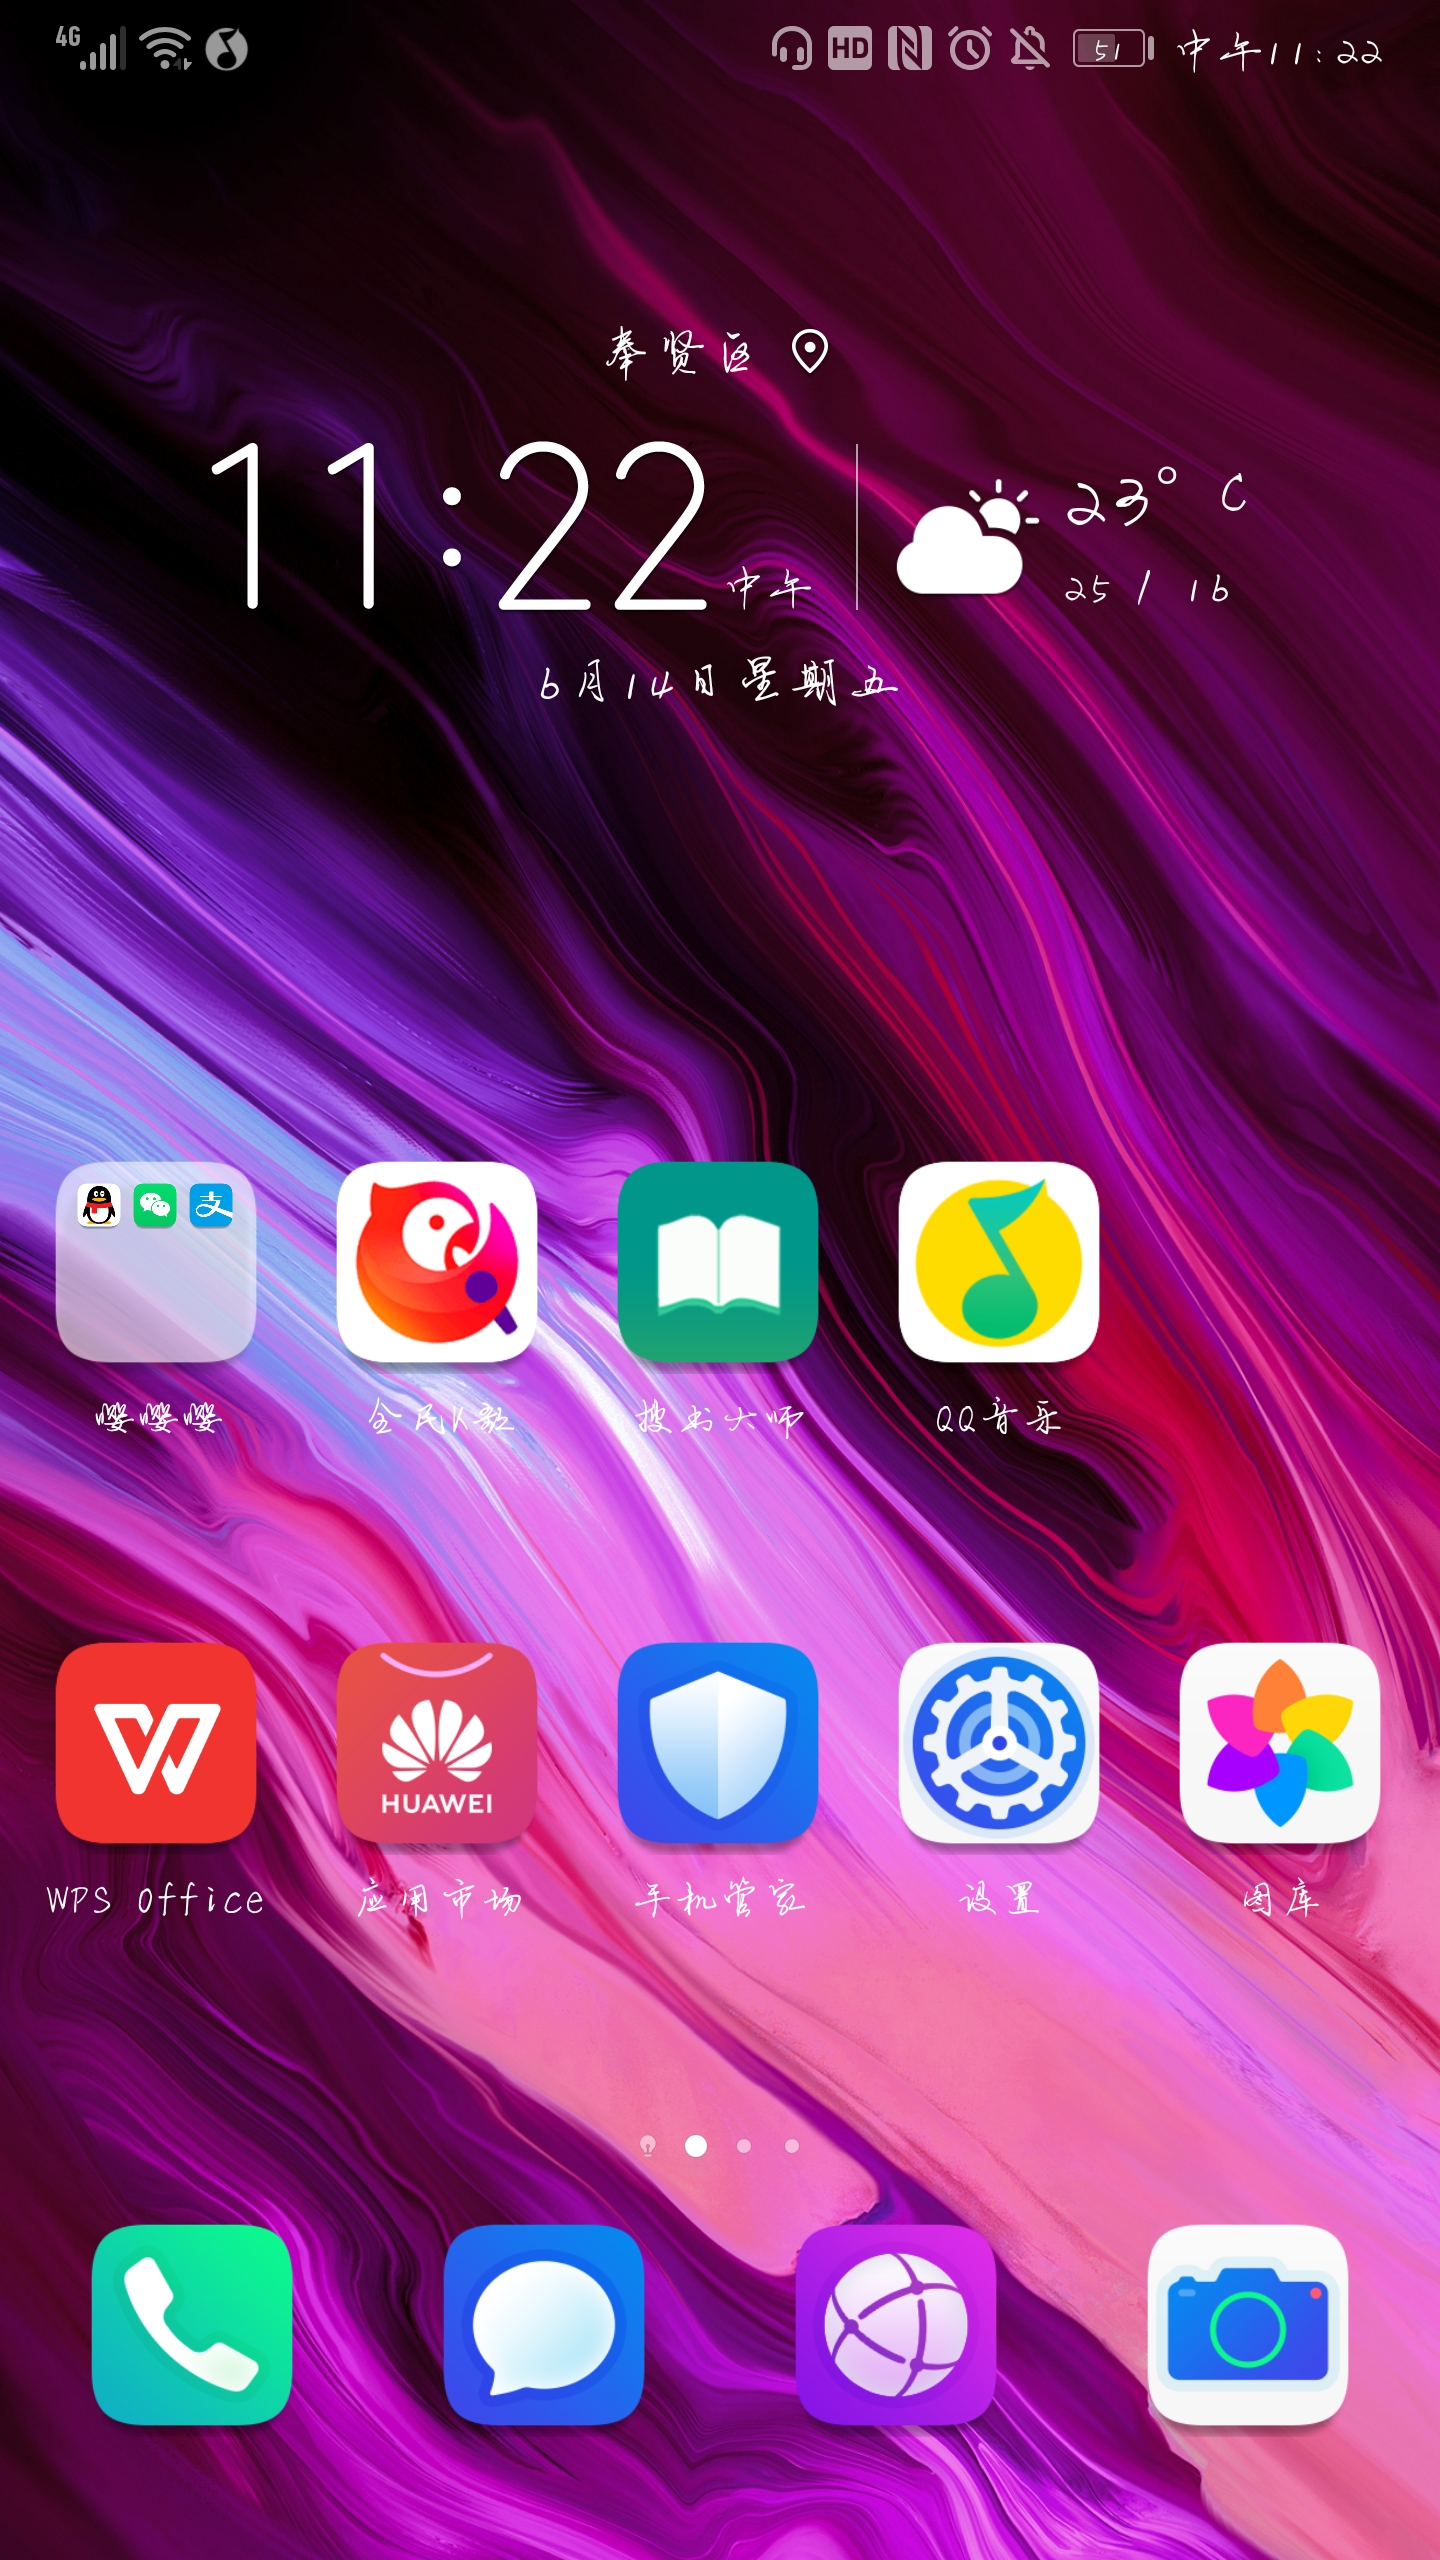 Screenshot_20190614_112210_com.huawei.android.lau.jpg